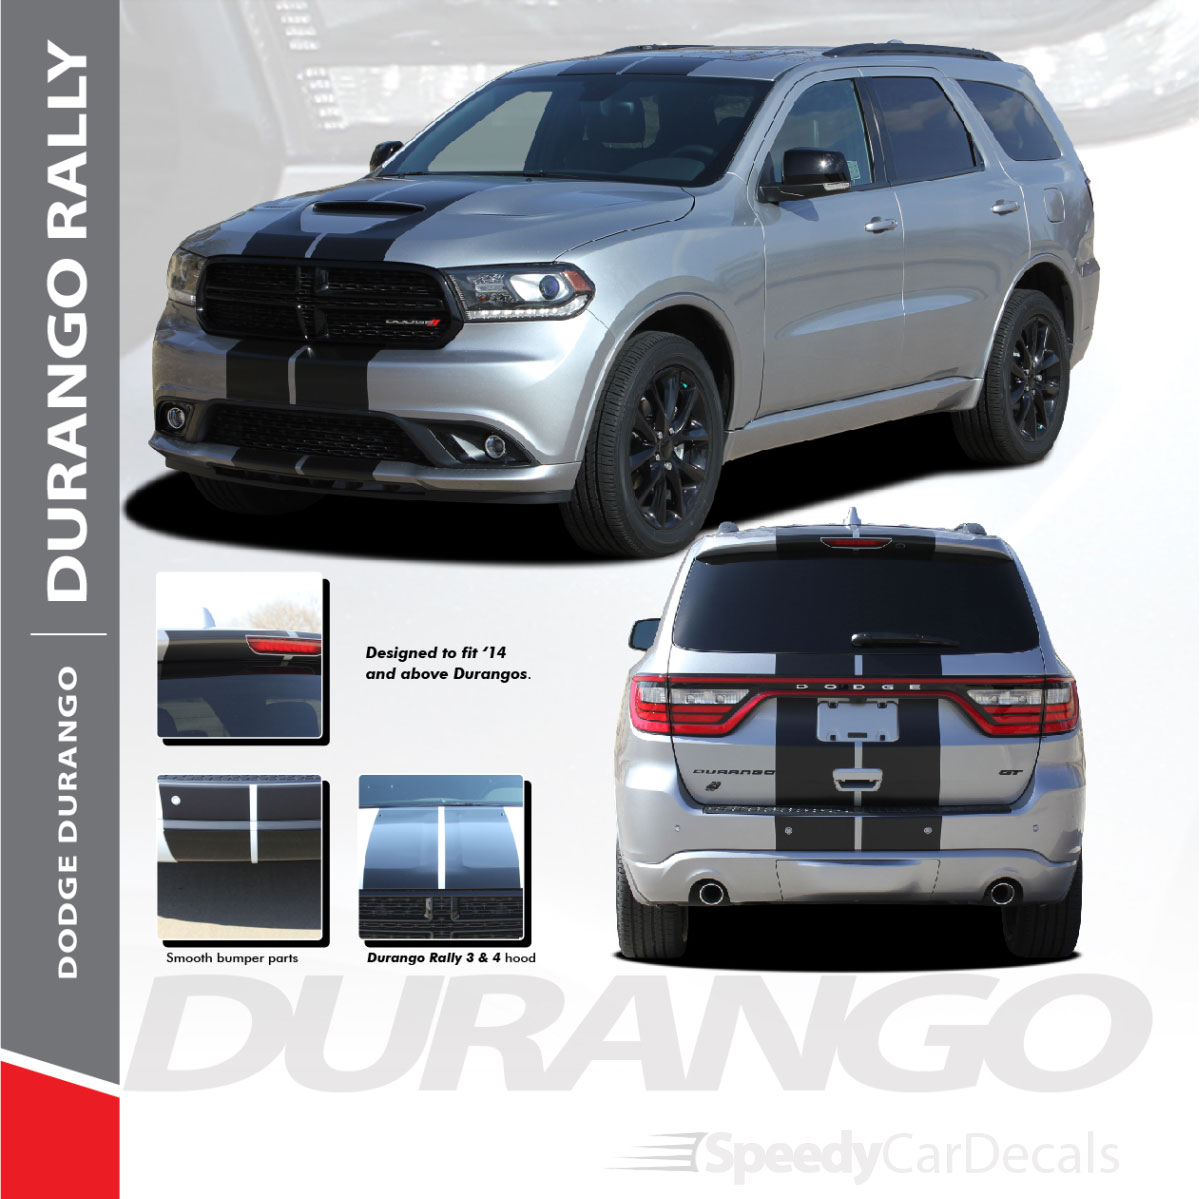 Dodge Durango Racing Stripes 3m Durango Rally 2014 2018 2019 2020 2021 Premium Auto Striping Speedycardecals Fast Car Decals Auto Decals Auto Stripes Vehicle Specific Graphics